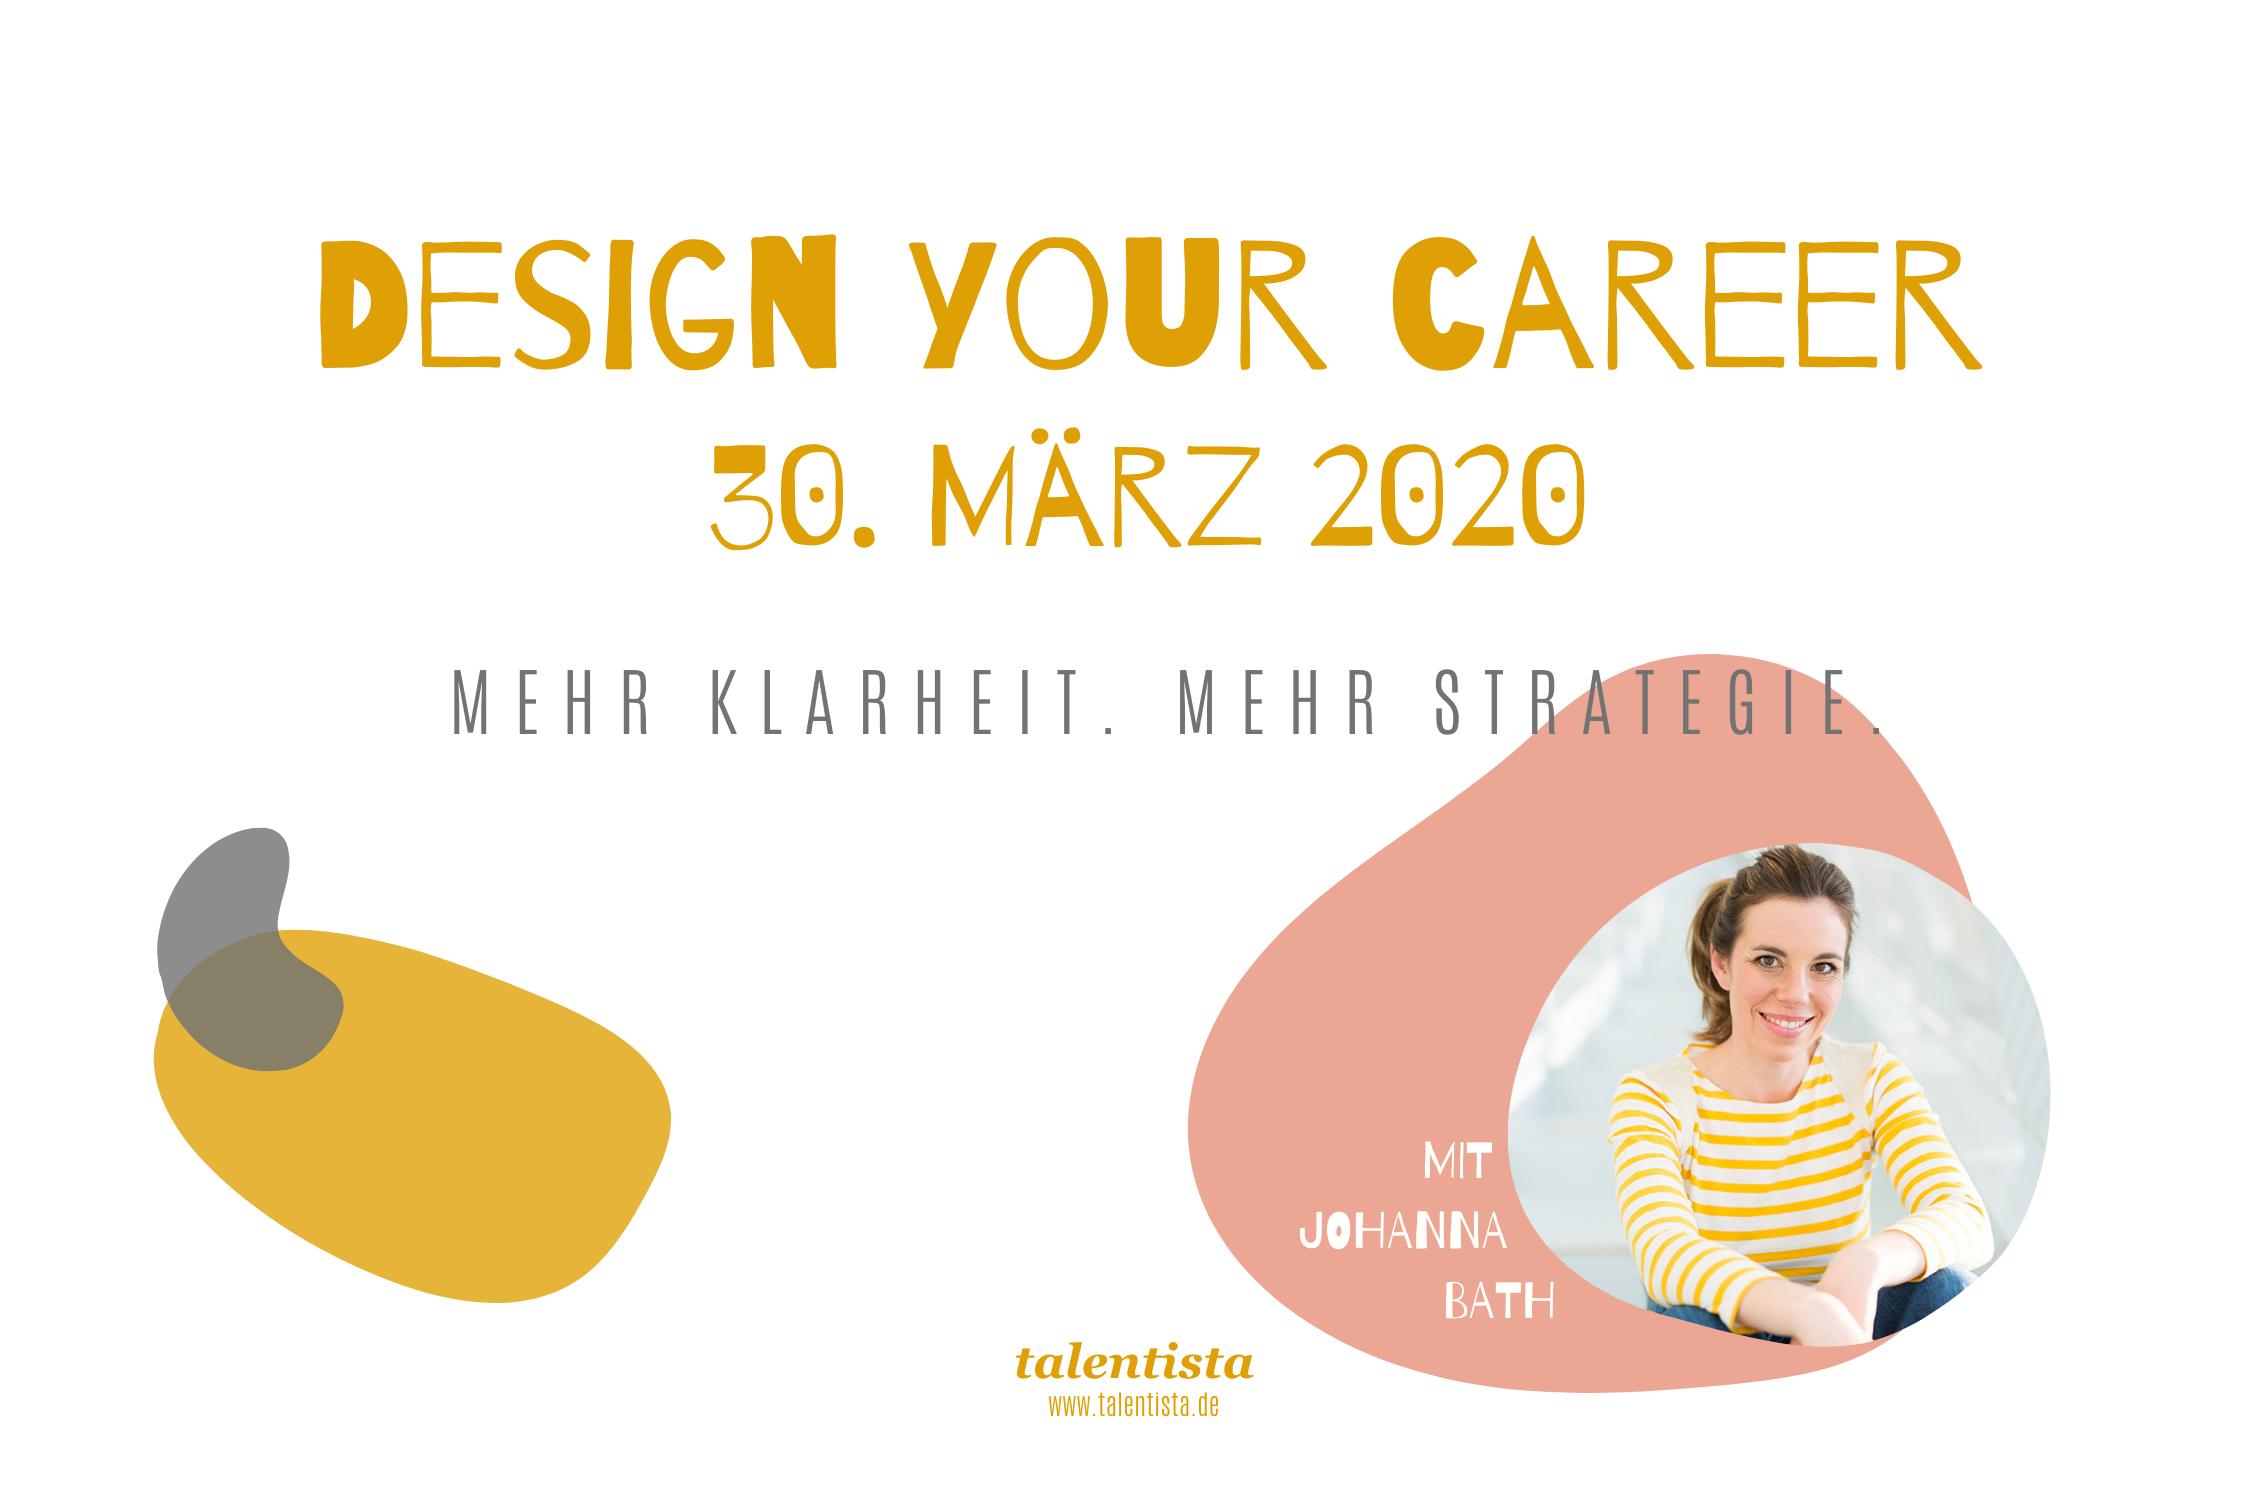 talentista-design-your-career-mentoring-programm